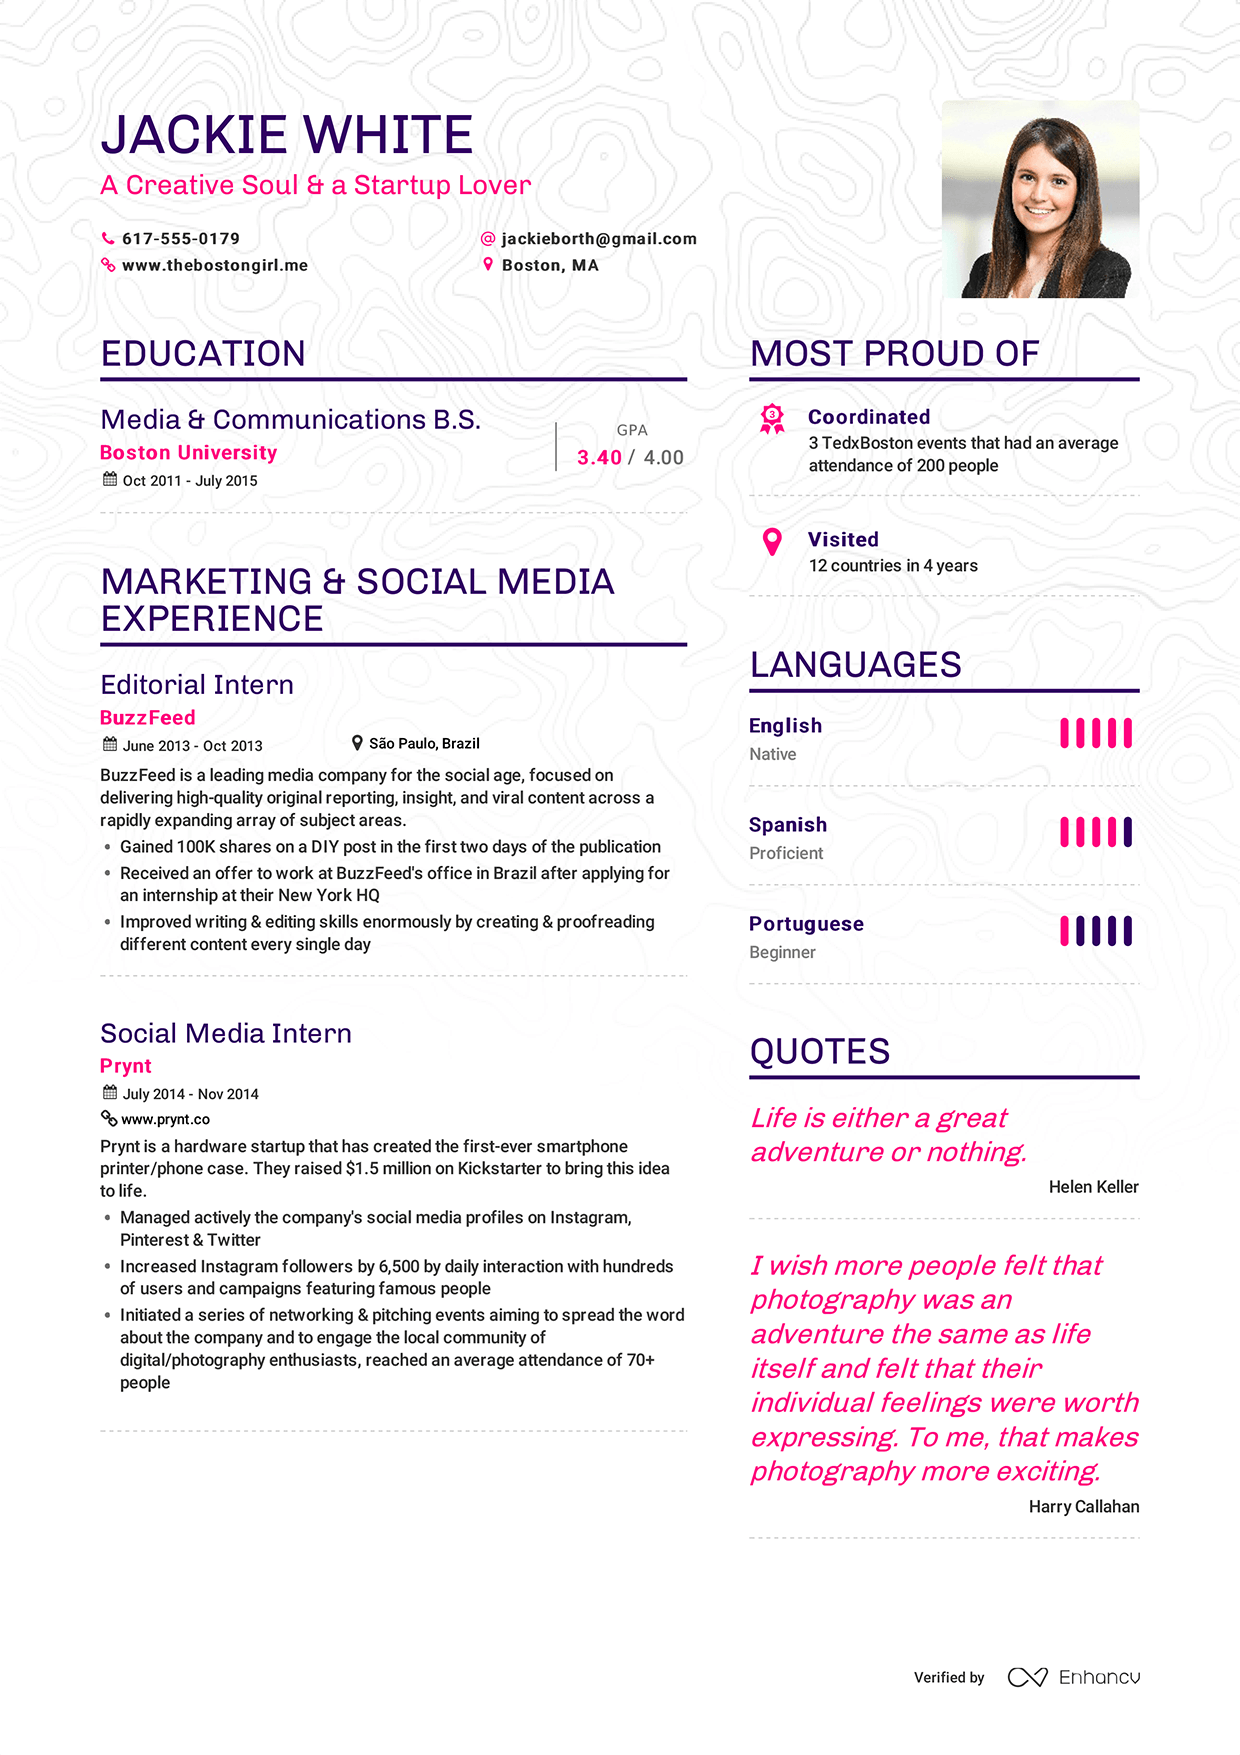 Enhance CV Beautiful Resumes Resume examples, Job resume